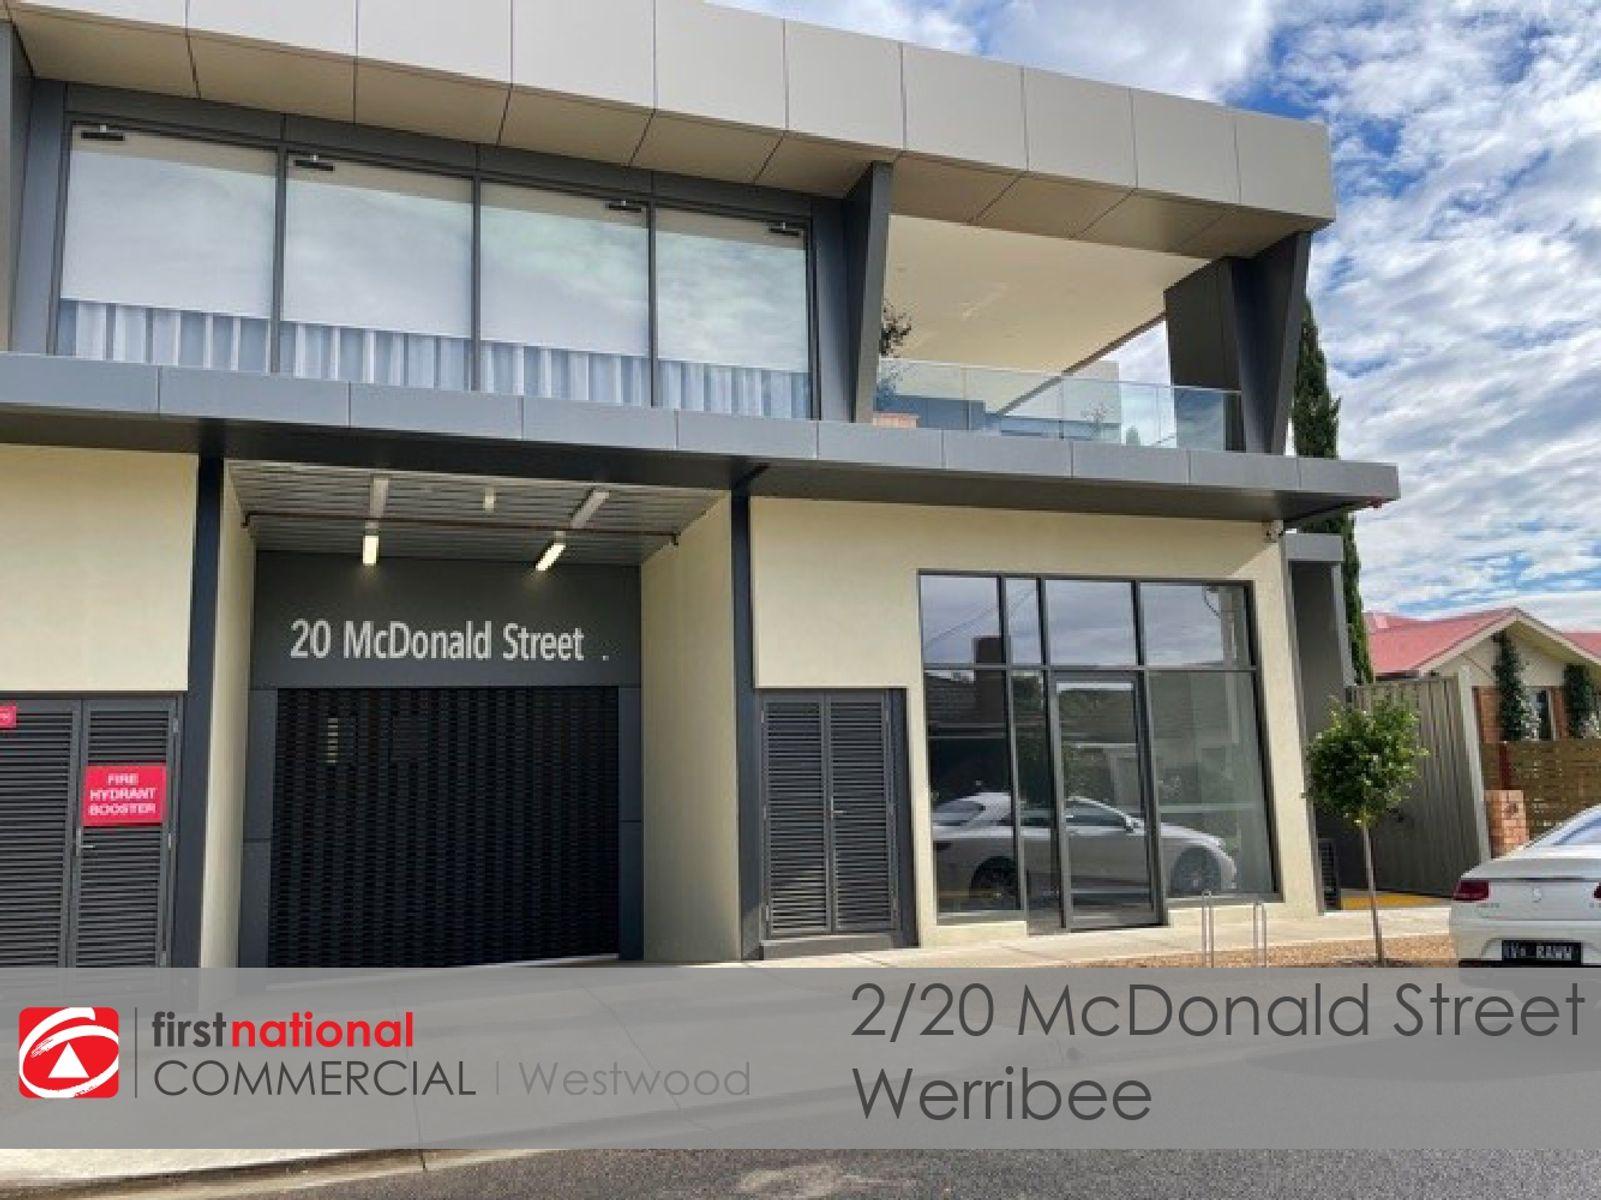 2/20 McDonald Street, Werribee, VIC 3030